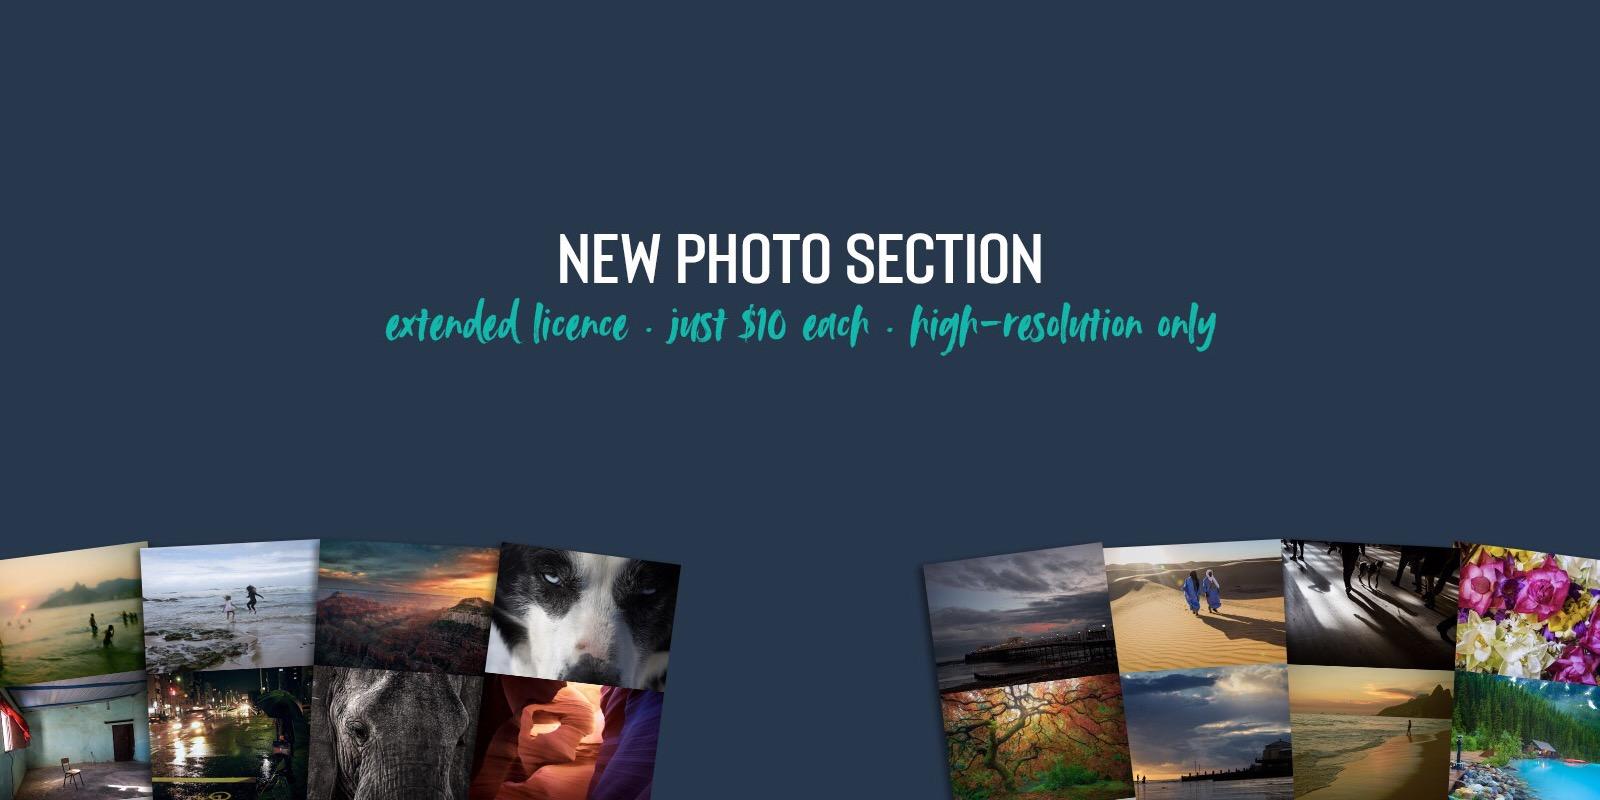 DesignCuts Photo Section